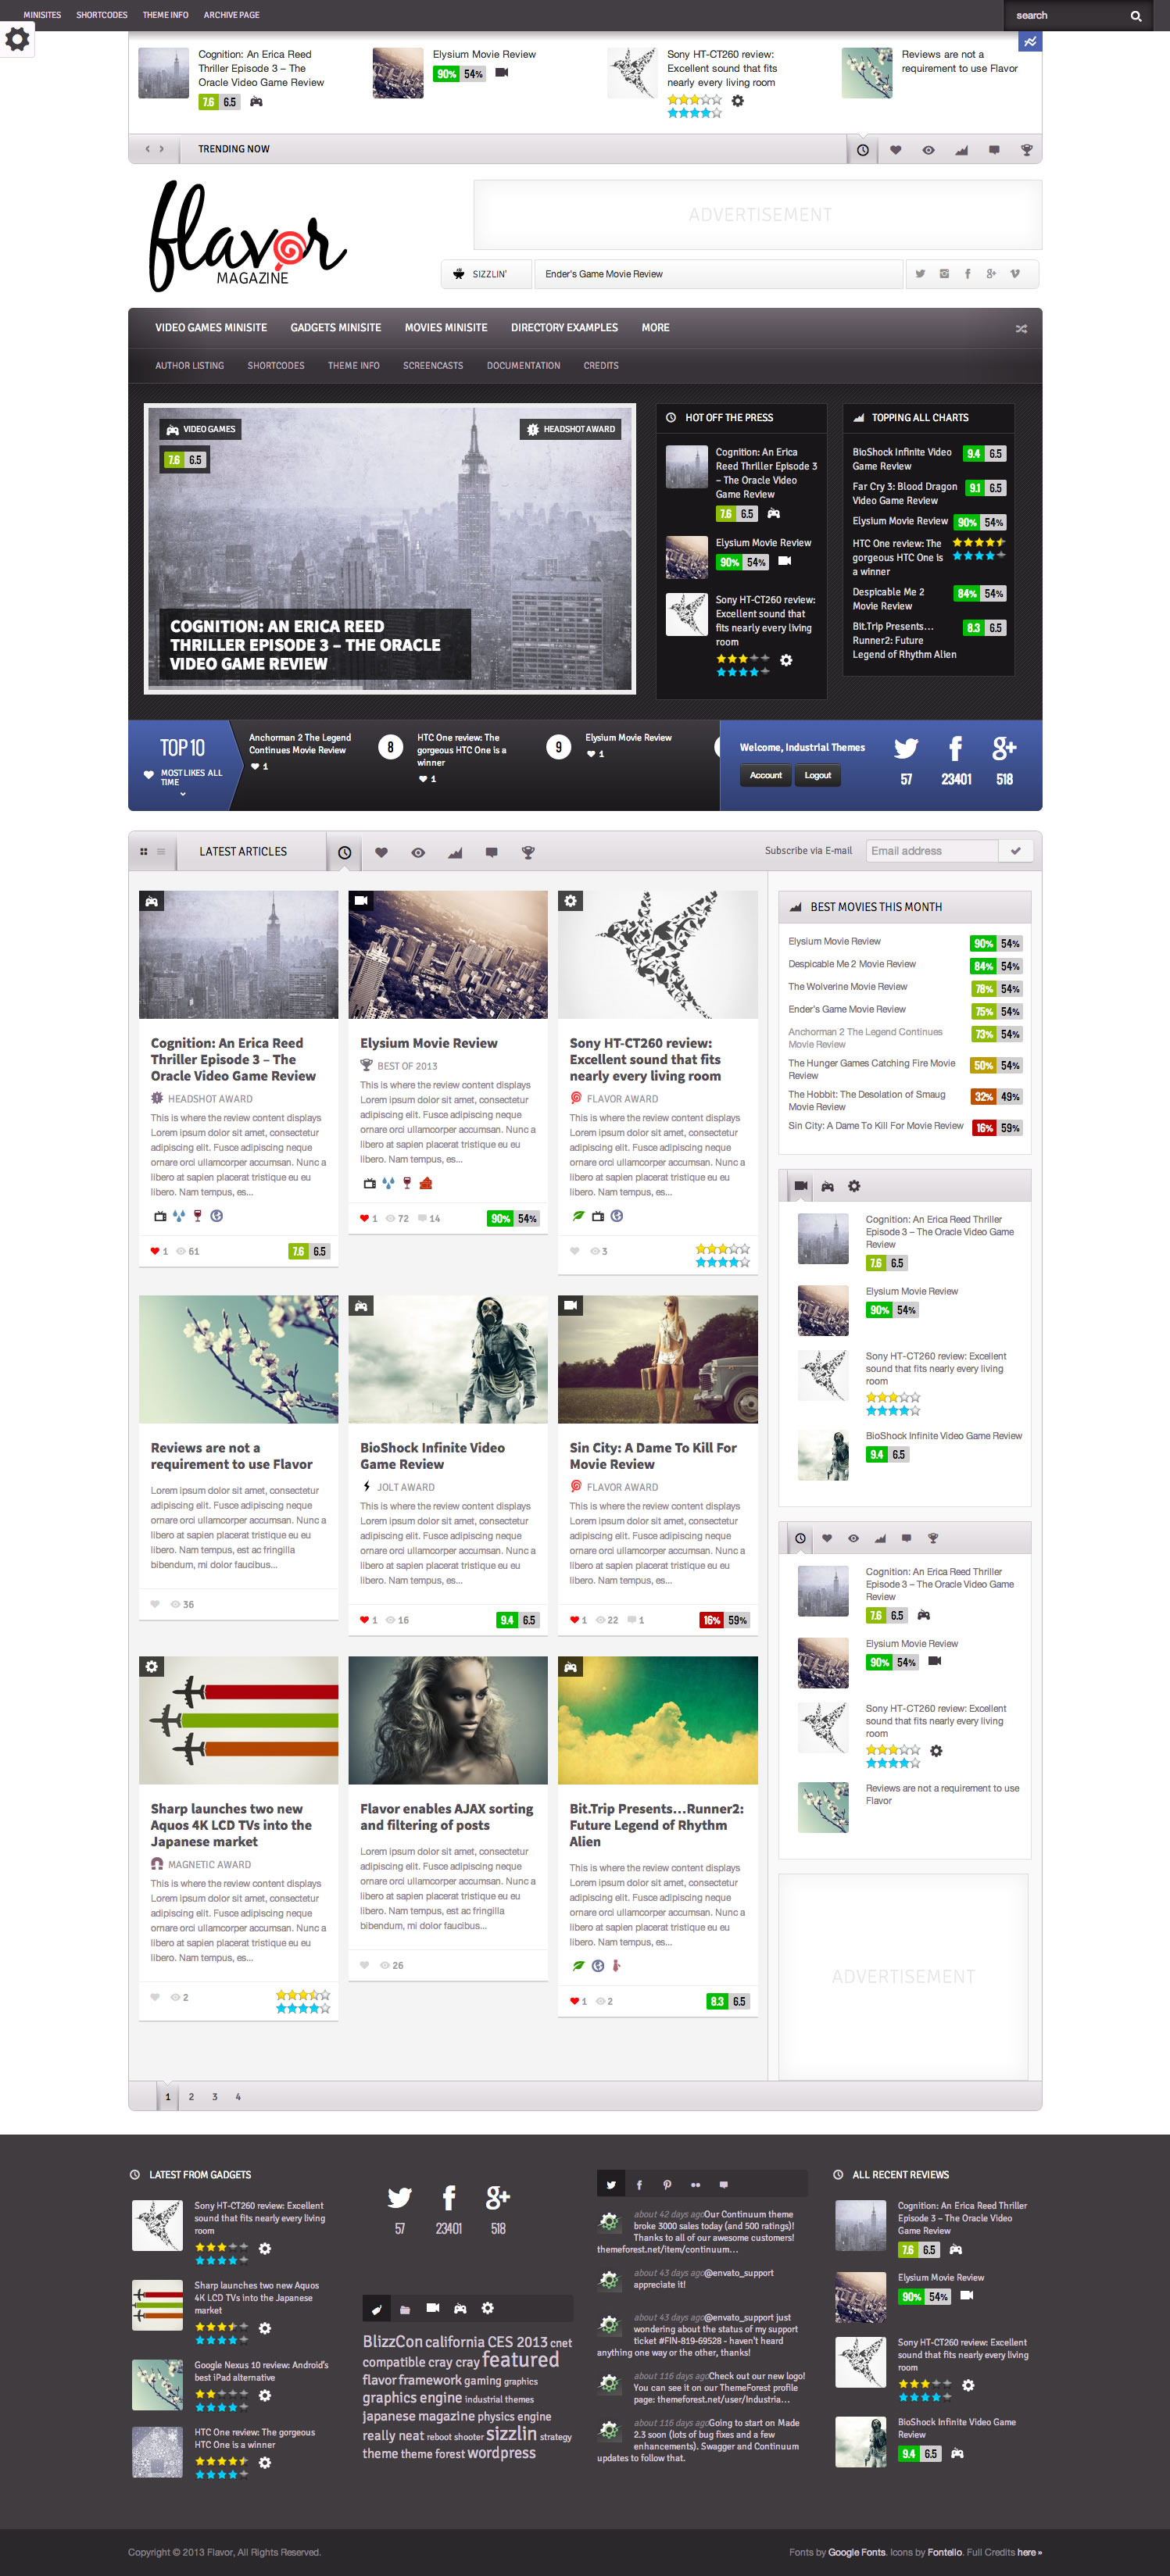 Flavor - Responsive/HD Magazine/Review AJAX Theme